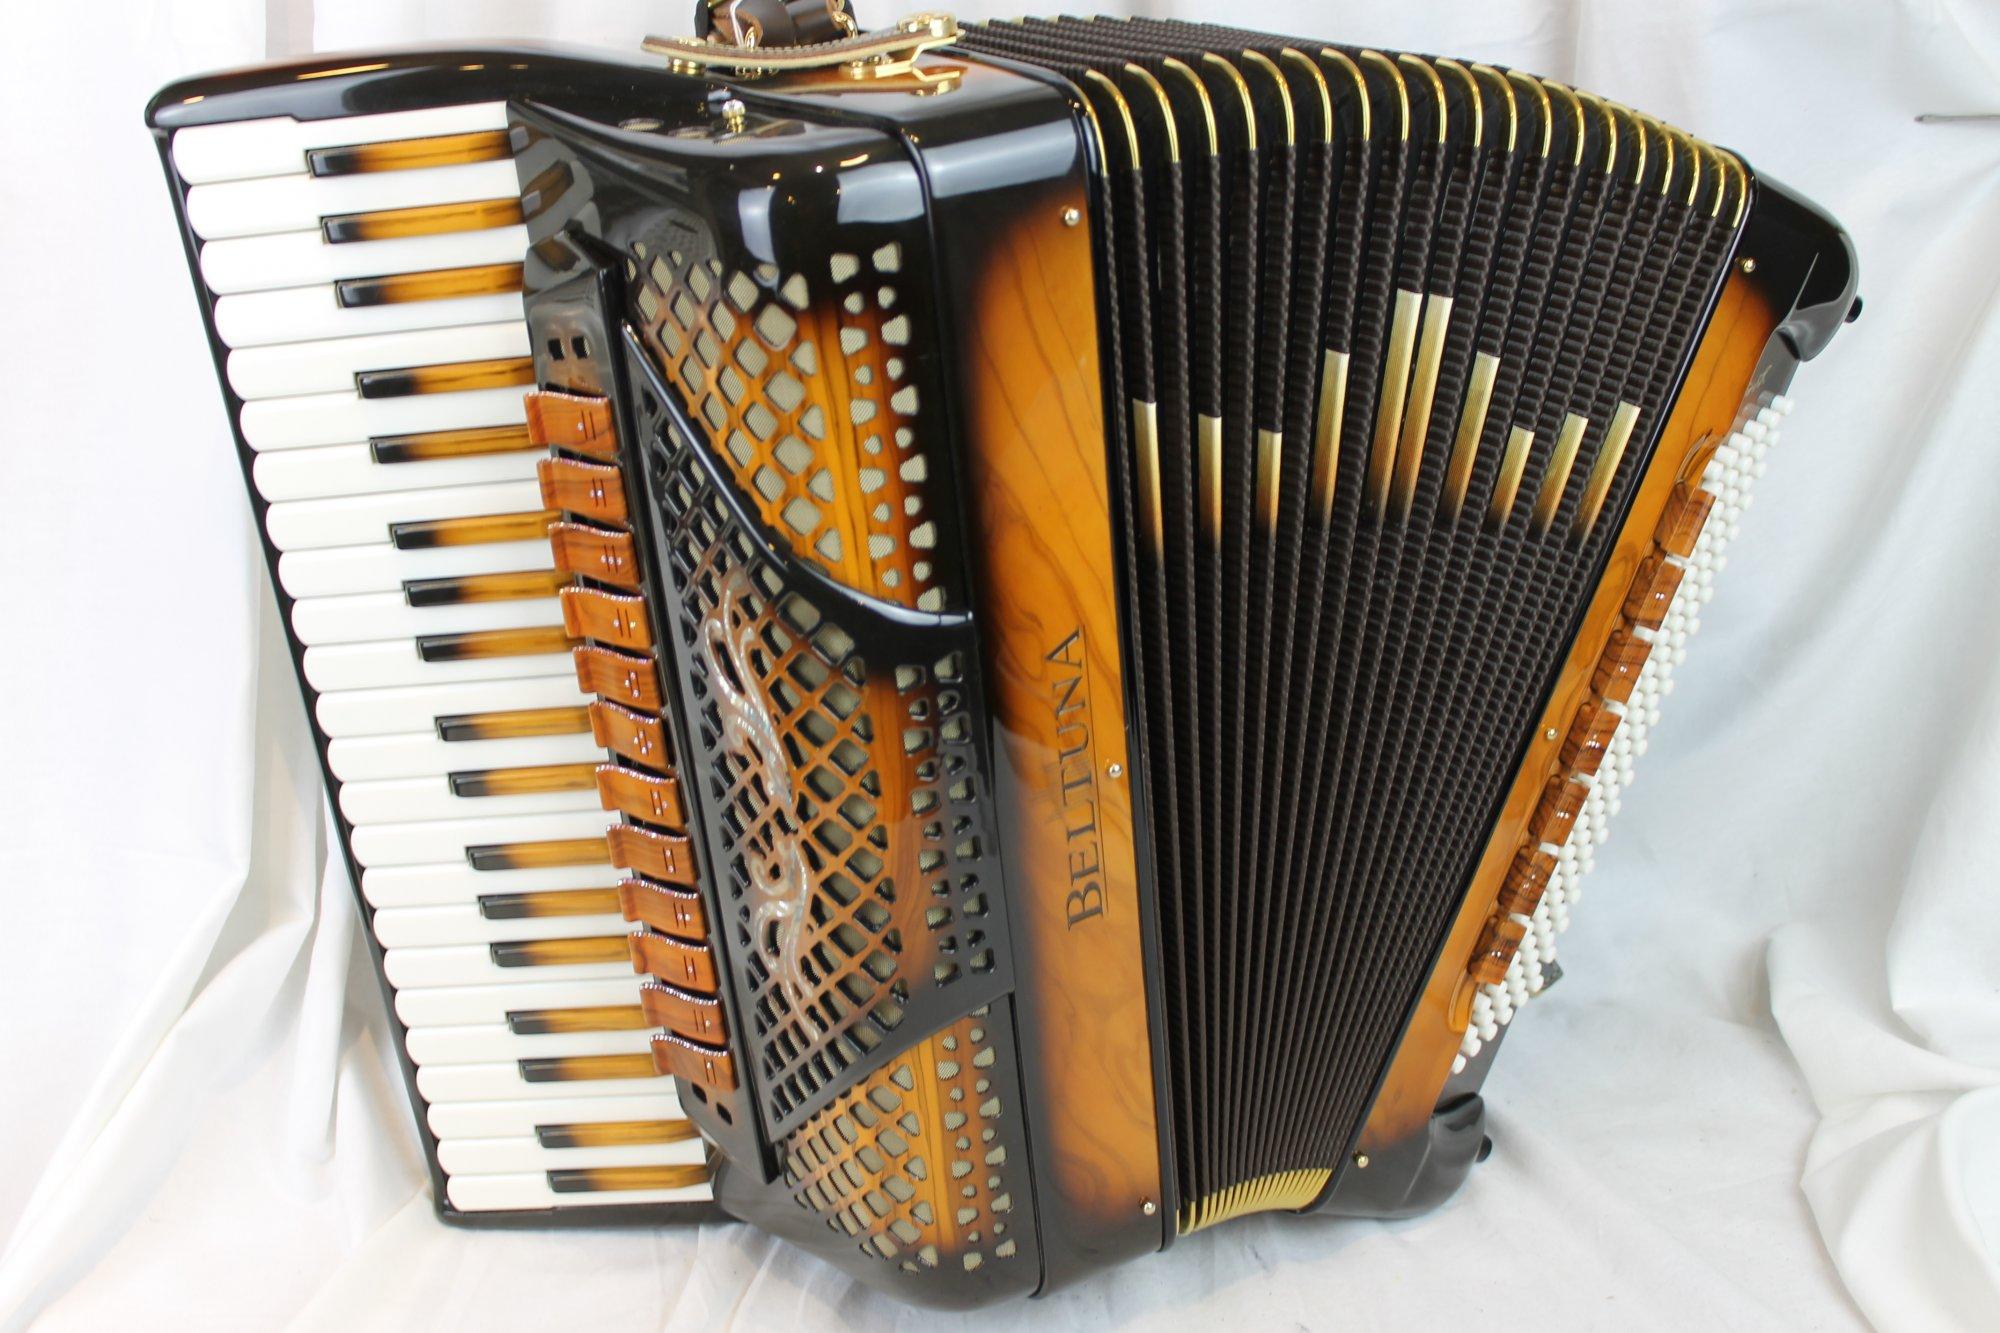 NEW Sunburst Beltuna Spirit IV Luxury Edition Piano Accordion LMMH 41 120